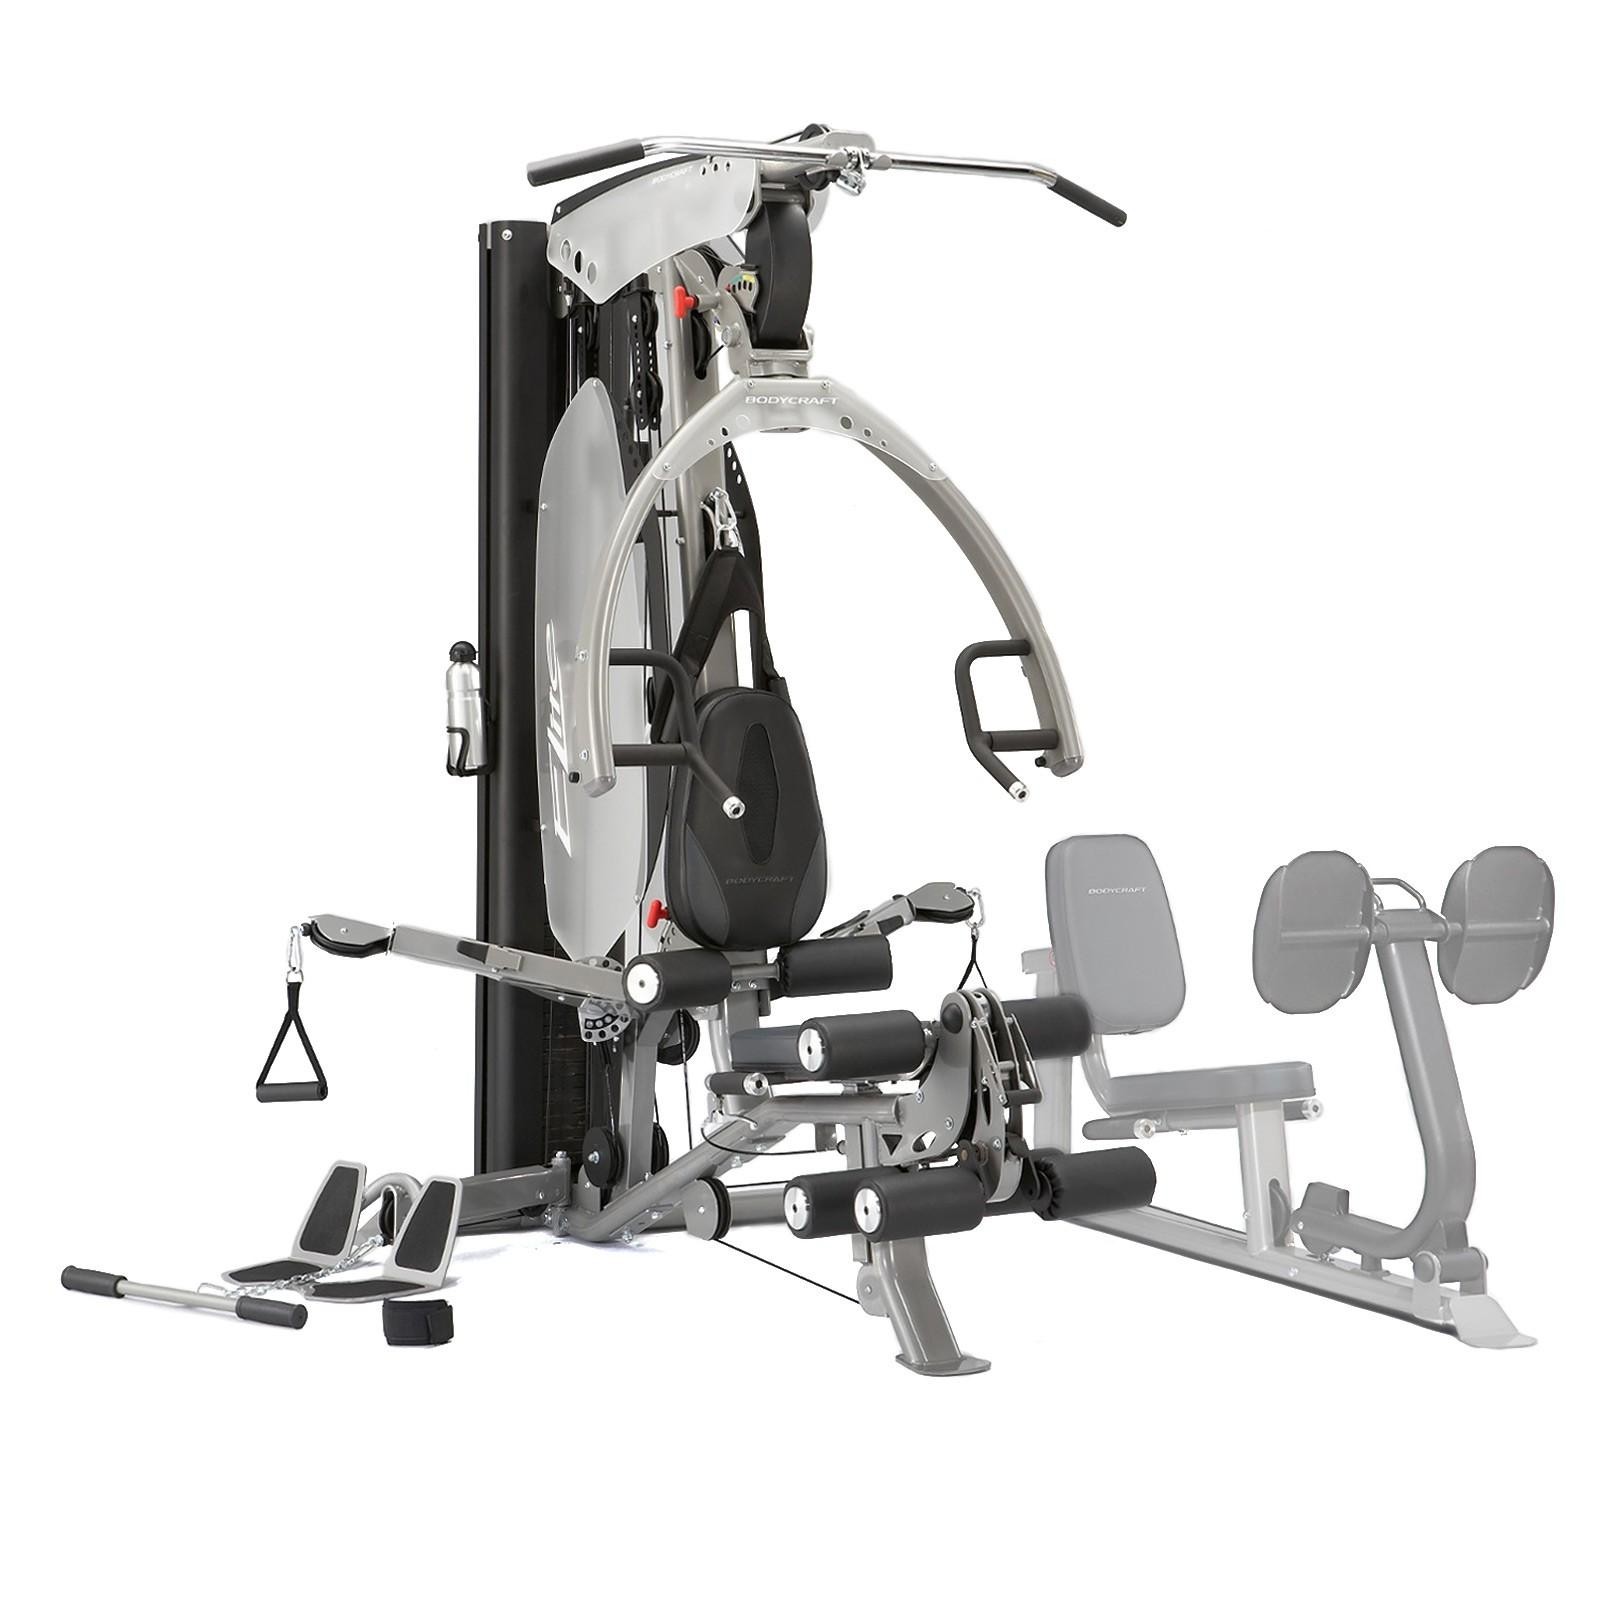 bodycraft appareil de musculation elite acheter bon prix chez t fitness. Black Bedroom Furniture Sets. Home Design Ideas